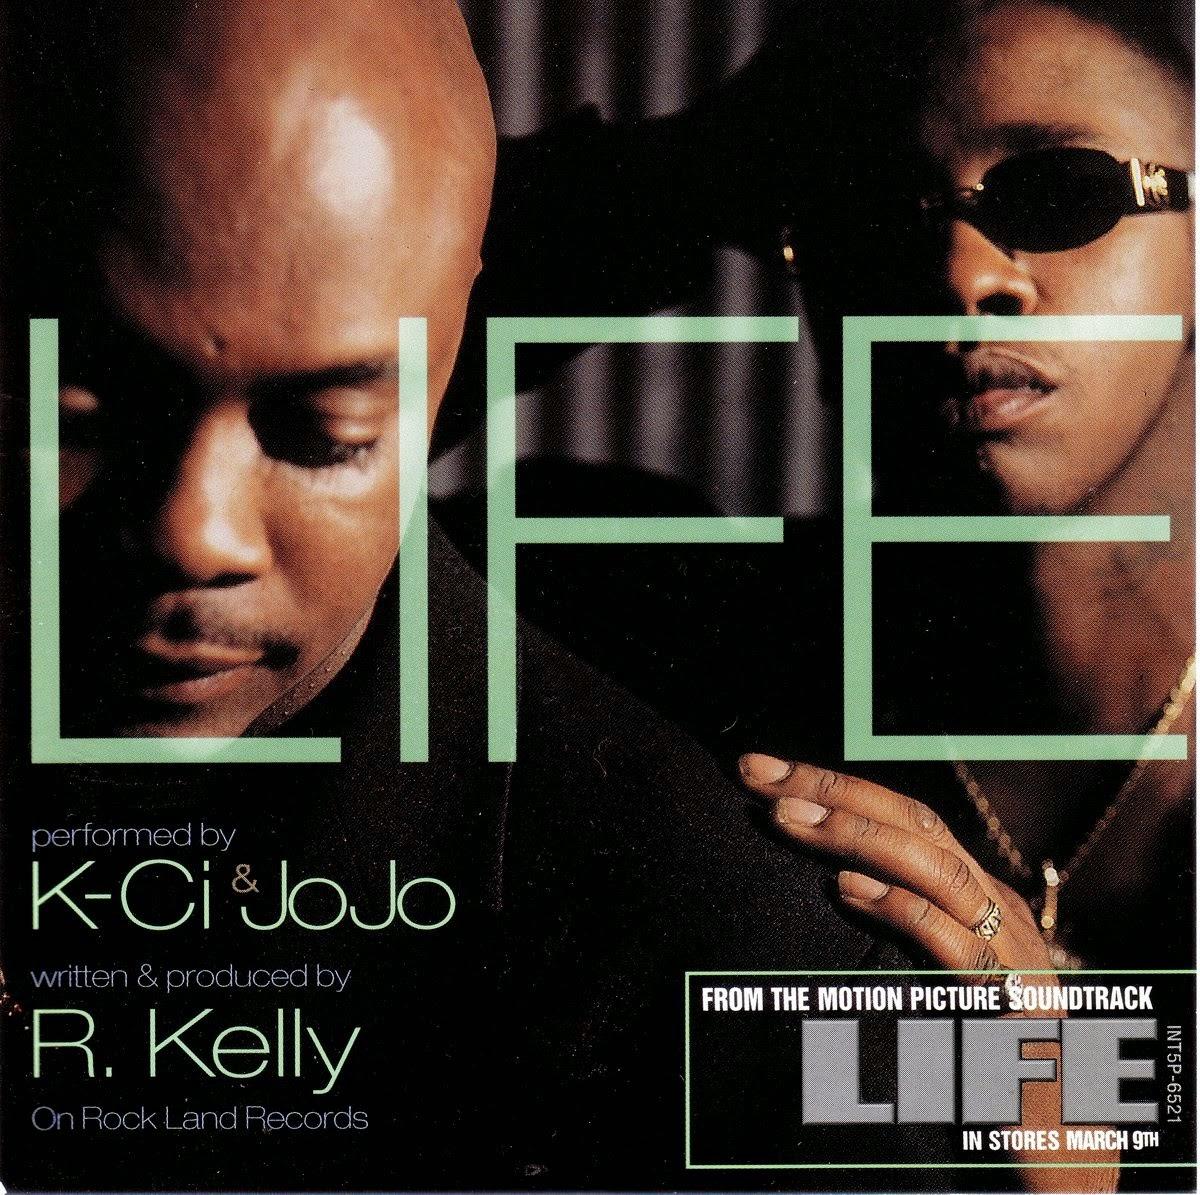 http://www.mediafire.com/download/vjilq7jtodtca7f/K_a_J-L(Promo,CDS)-1999.7z